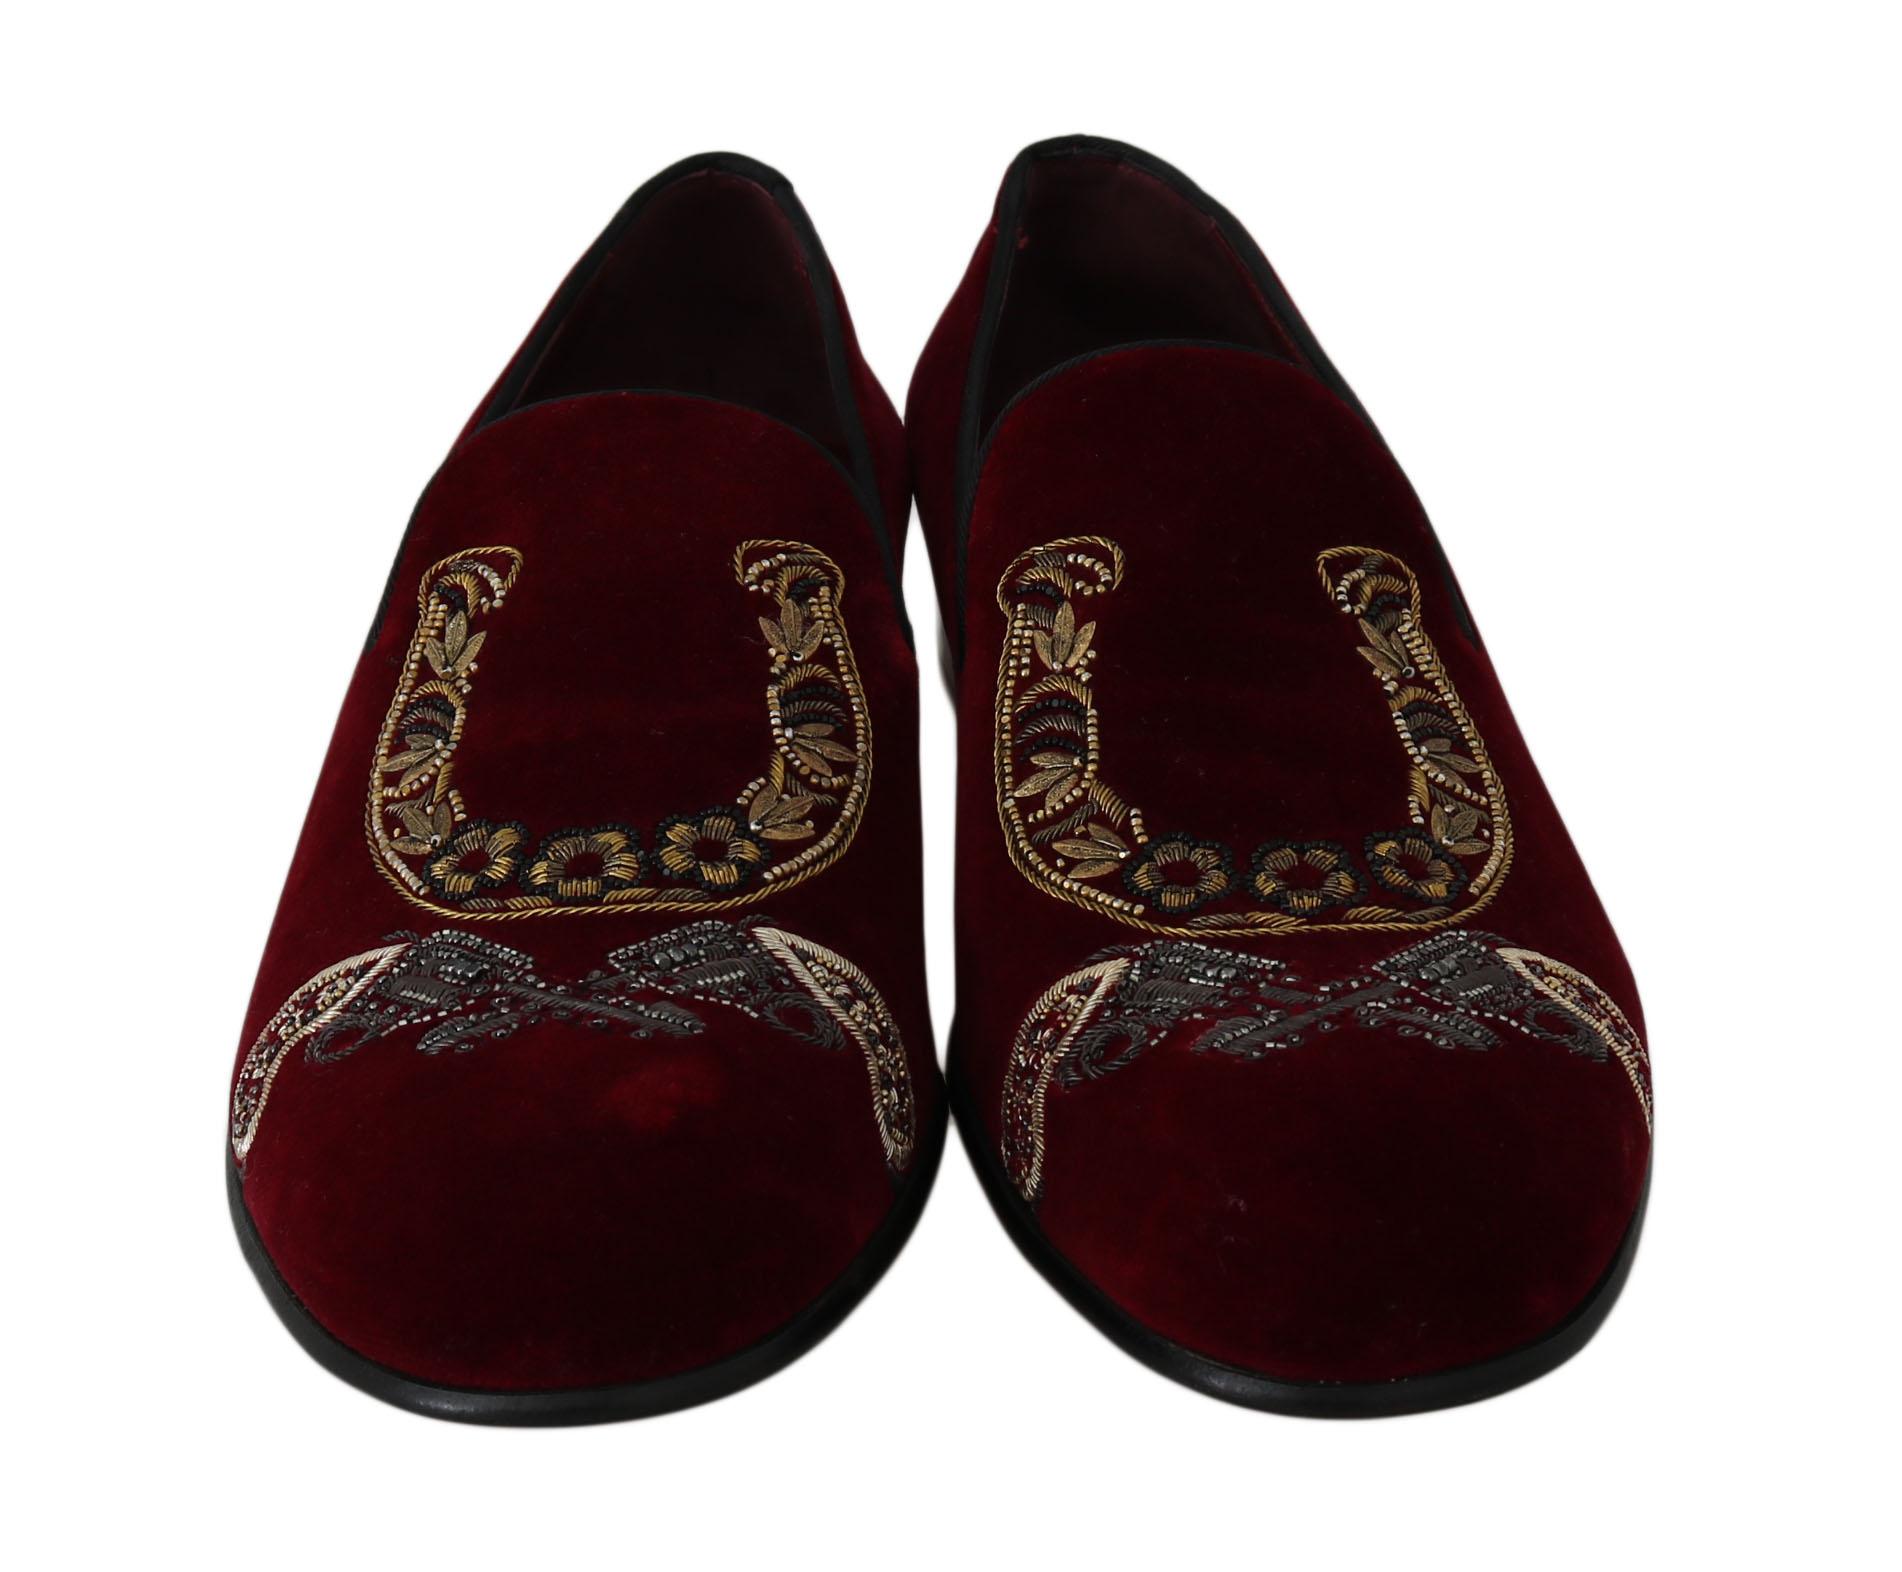 Dolce & Gabbana Men's Velvet Gun Loafers Shoes Bordeaux MV2192 - EU43/US10